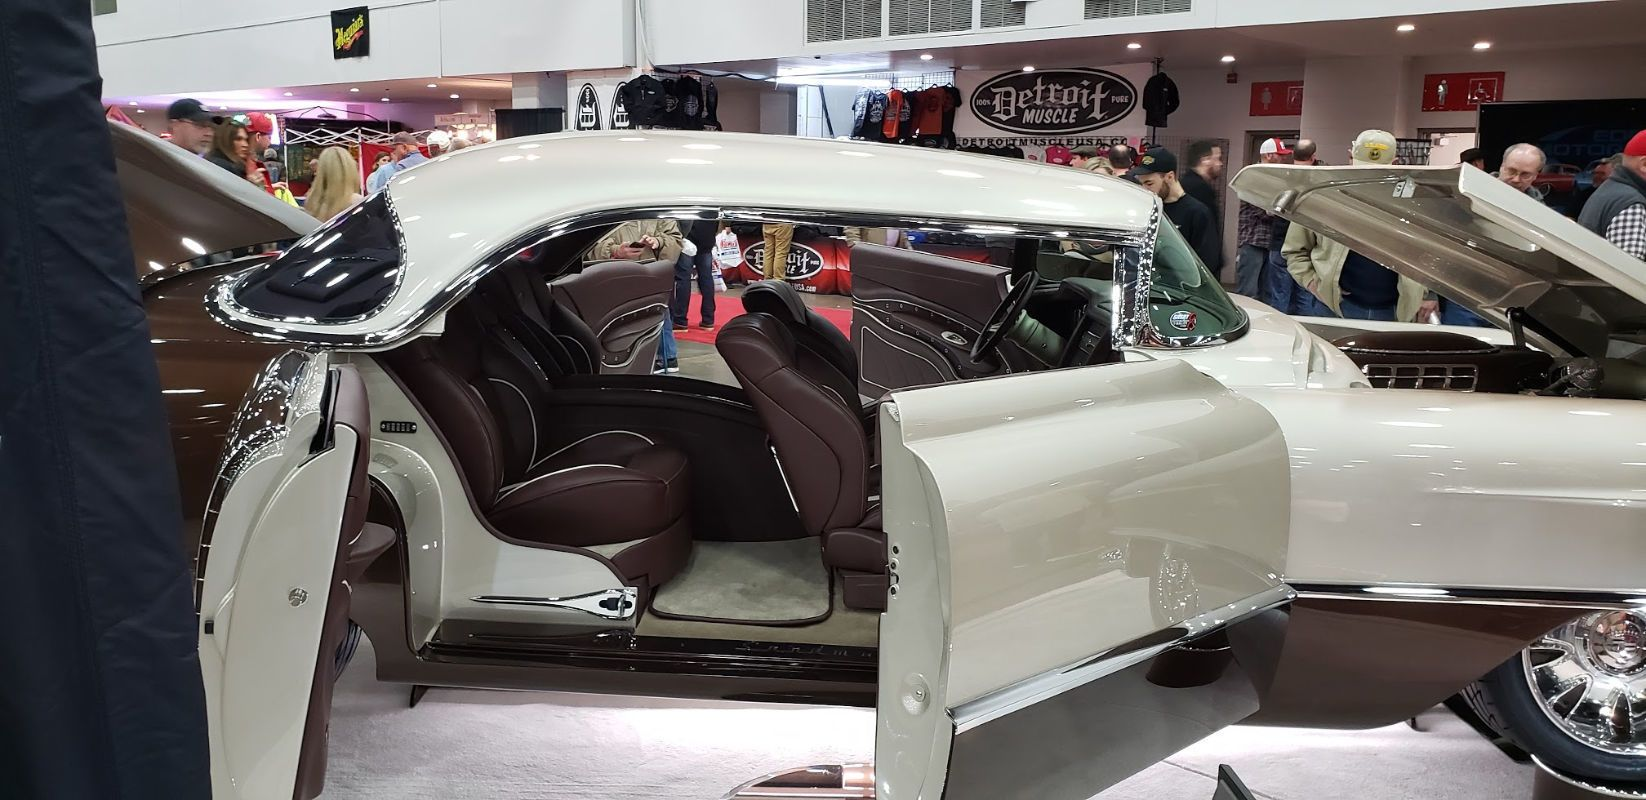 1955 Cadillac DeVille sandman